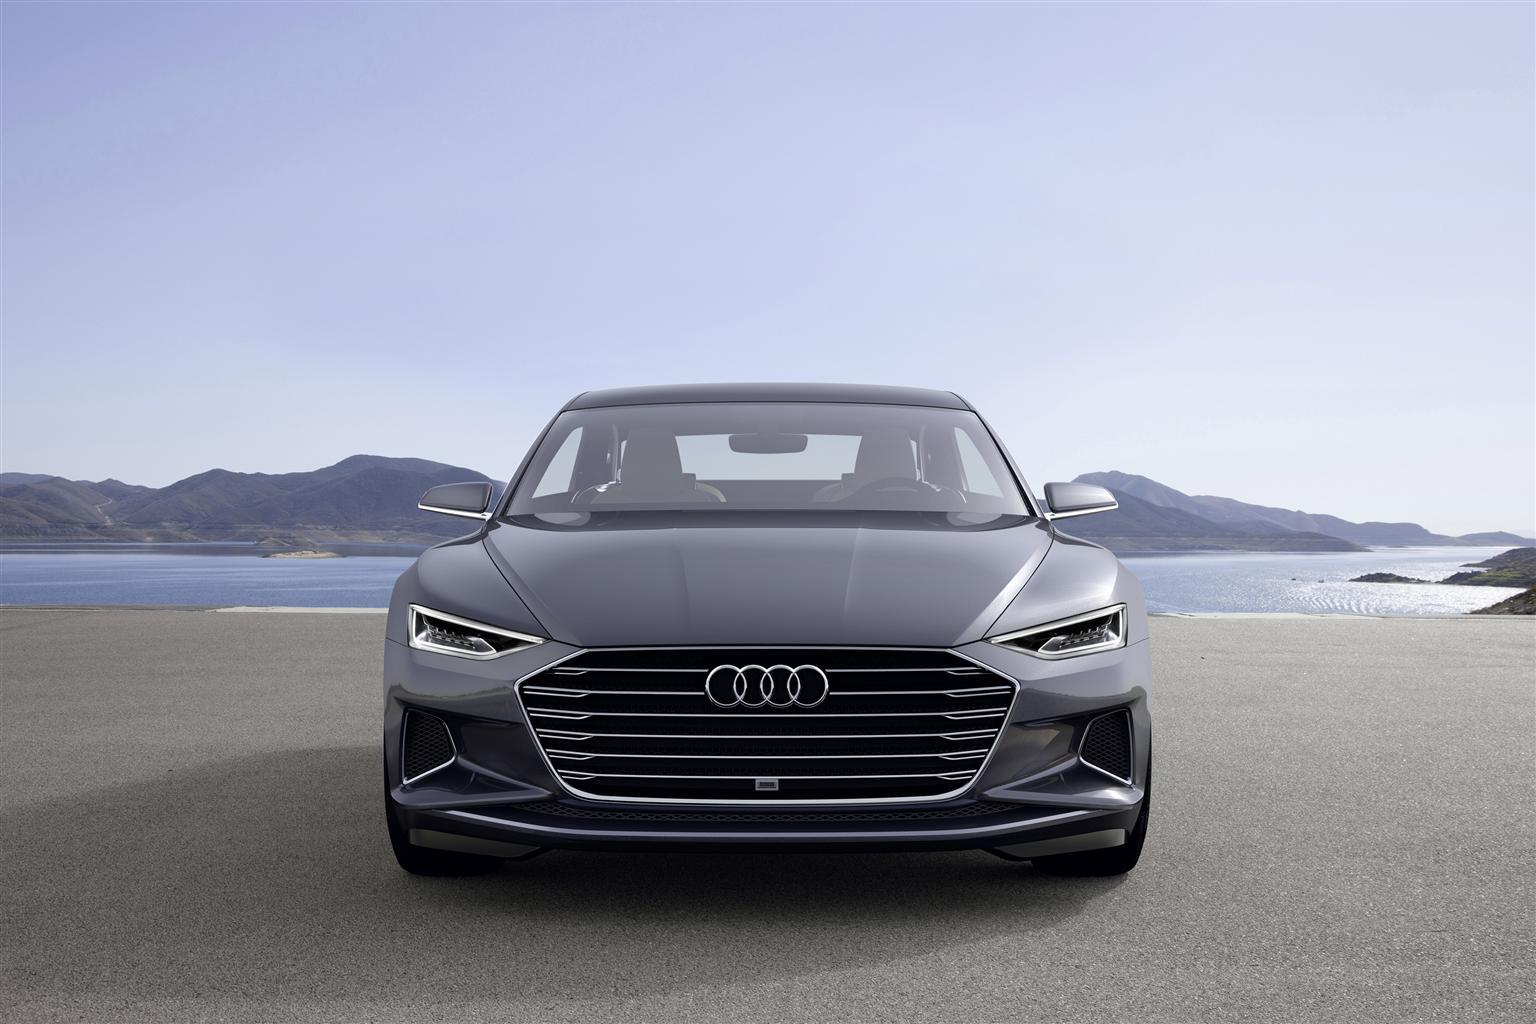 Audi al CES 2015 - image 003338-000031988 on https://motori.net